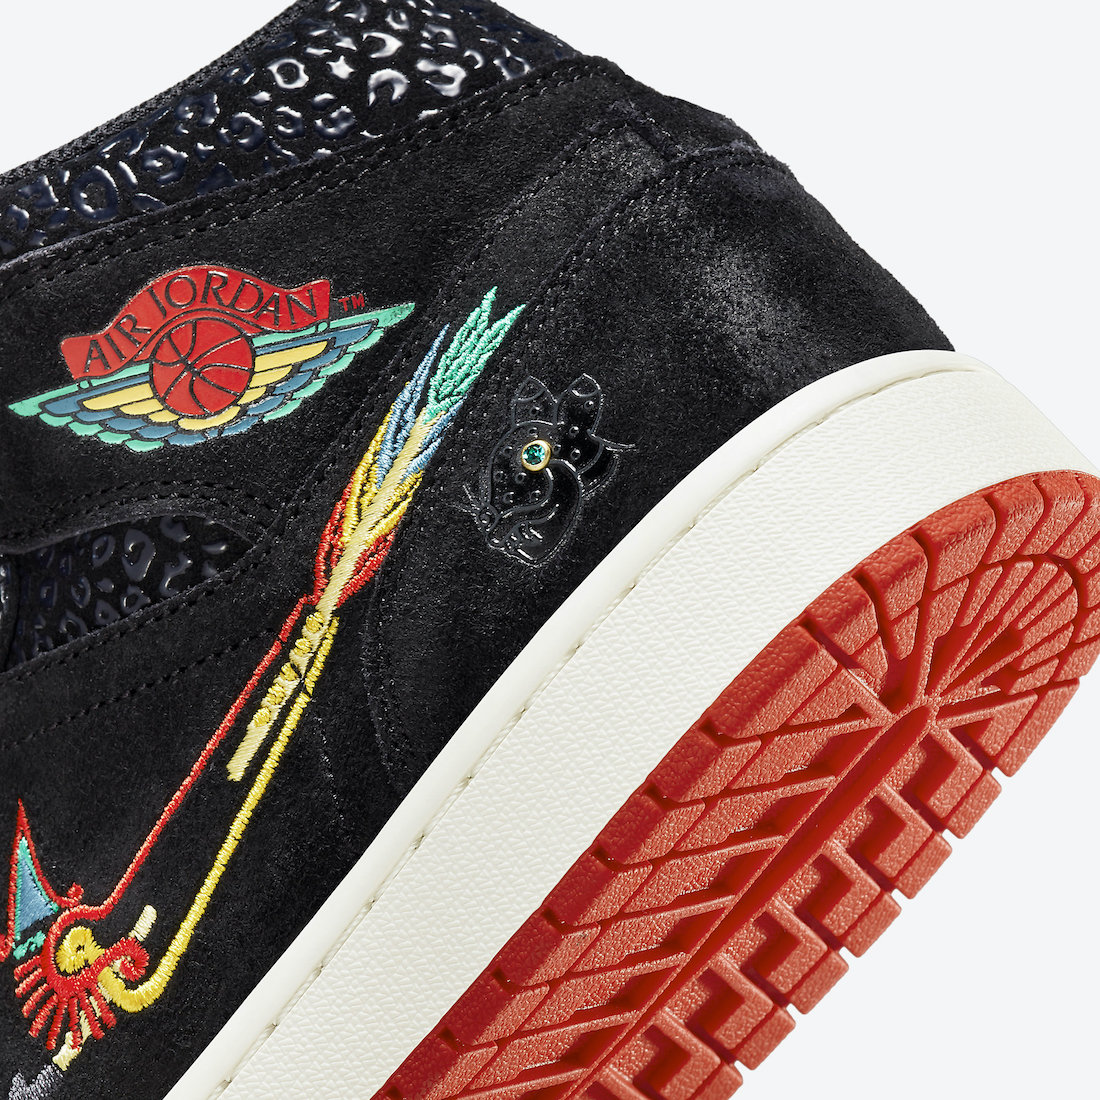 DN4904-001,AJ1,Air Jordan 1 DN4904-001 又凶又帅!亡灵节 Air Jordan 1 Mid 官图来了!本月发售